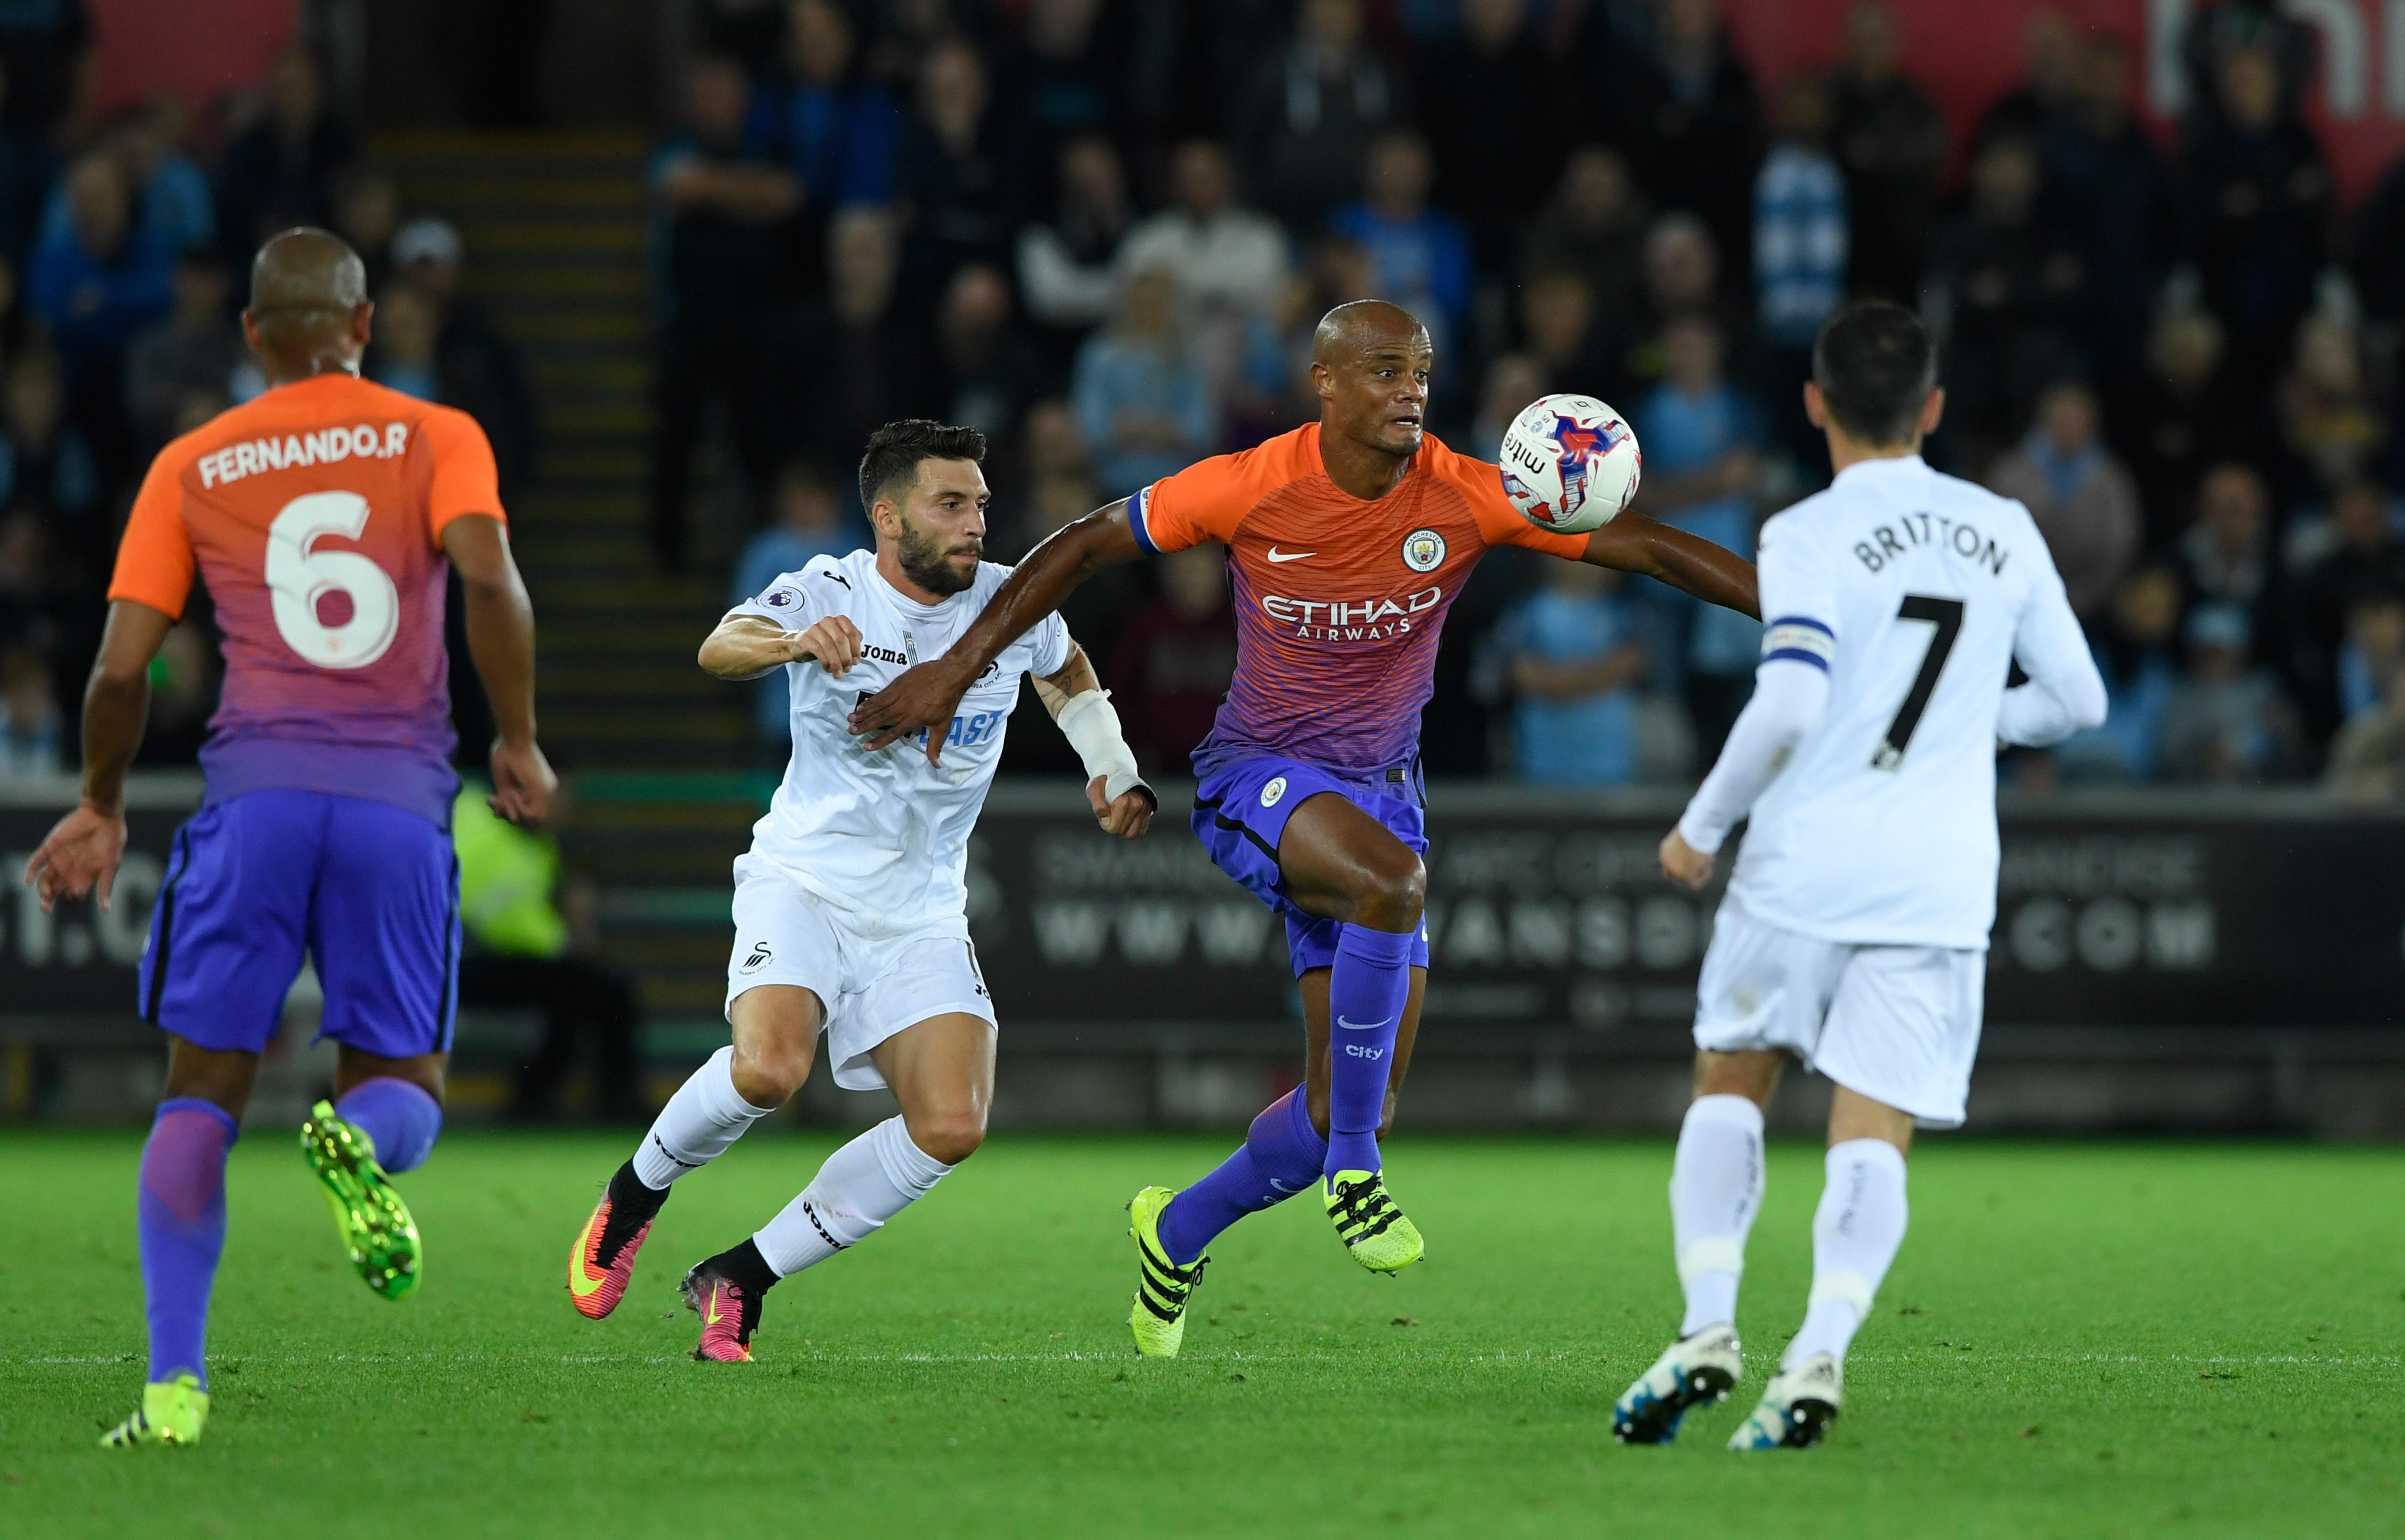 Manchester City Injury Update: Kompany, Silva & Delph